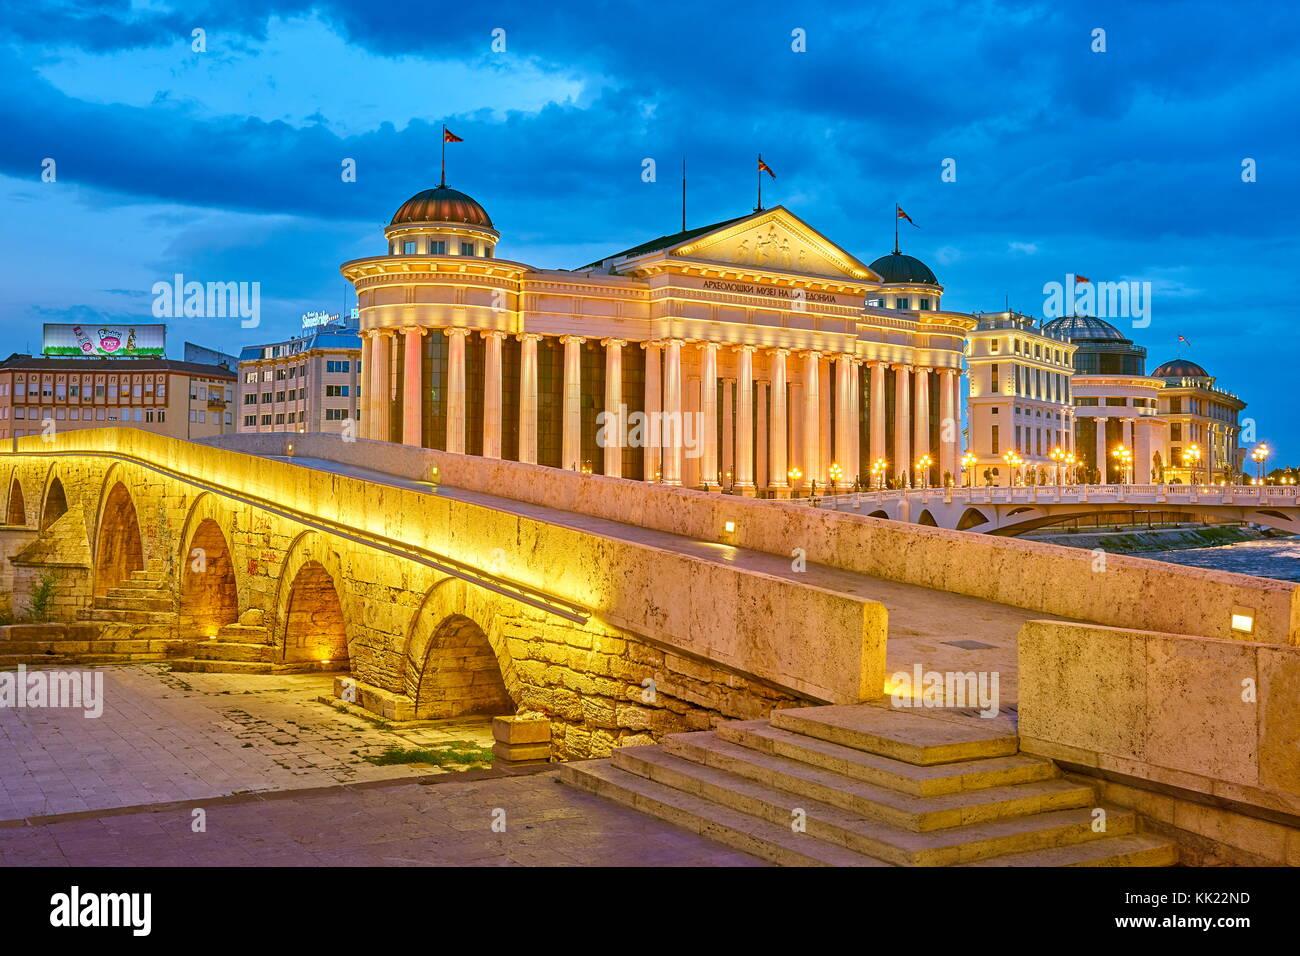 Stone Bridge and Archeological Museum of Macedonia at evening, Skopje, Republic of Macedonia - Stock Image